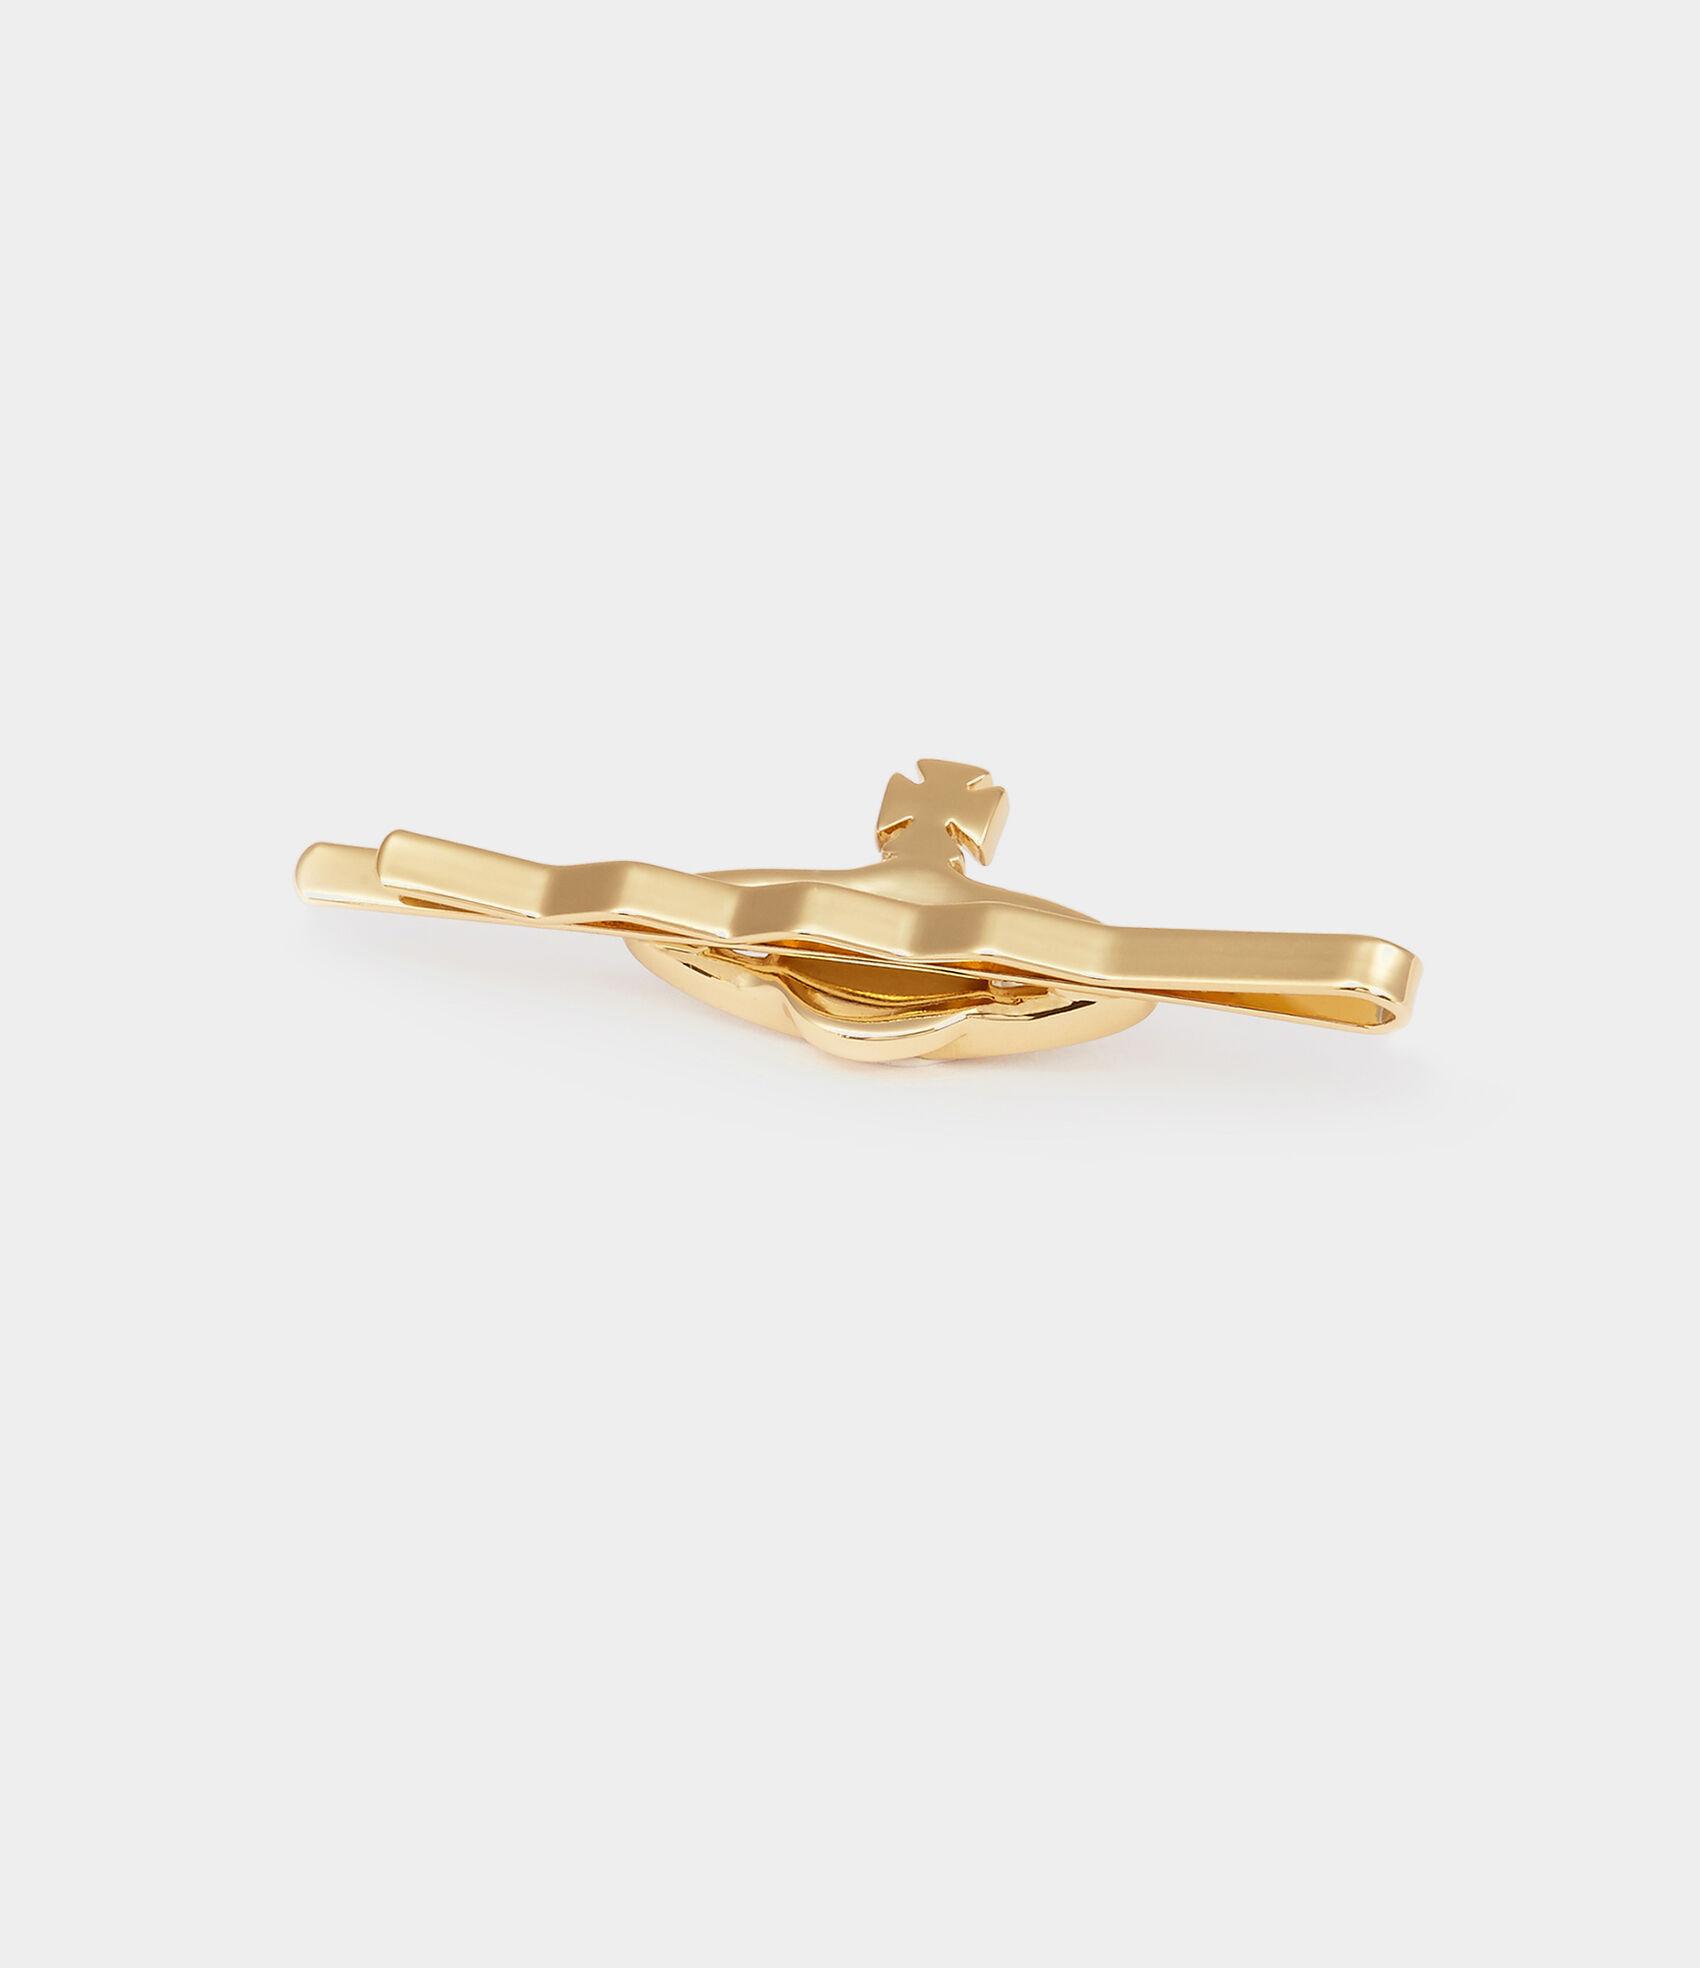 Vivienne Westwood Men's Designer Cufflinks And Pins | Vivienne Westwood -  Mini Bas Relief Tie Clip